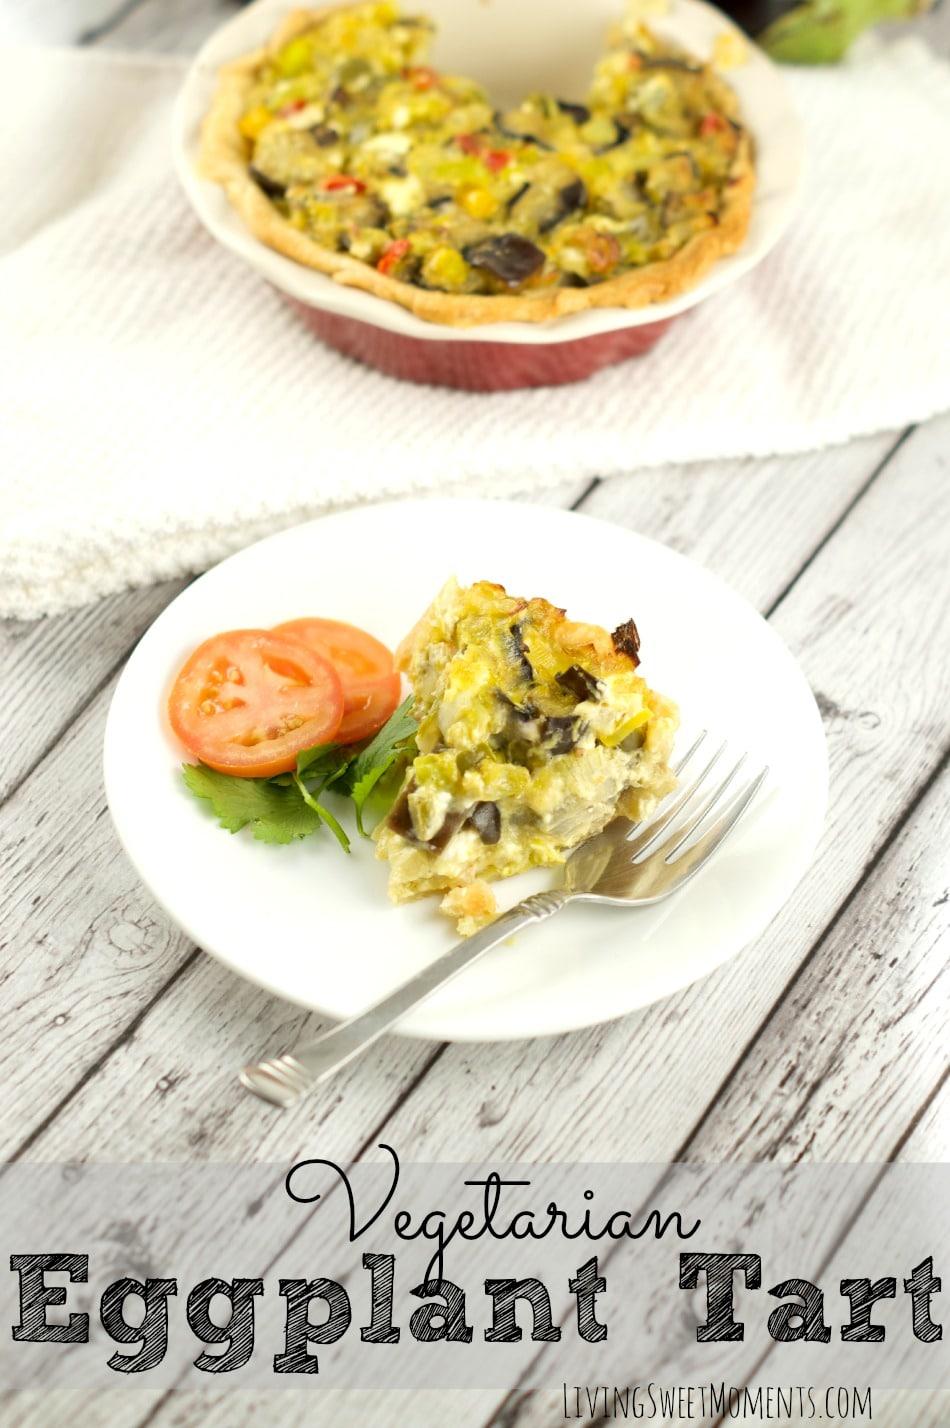 eggplant-tarte-recipe-cover